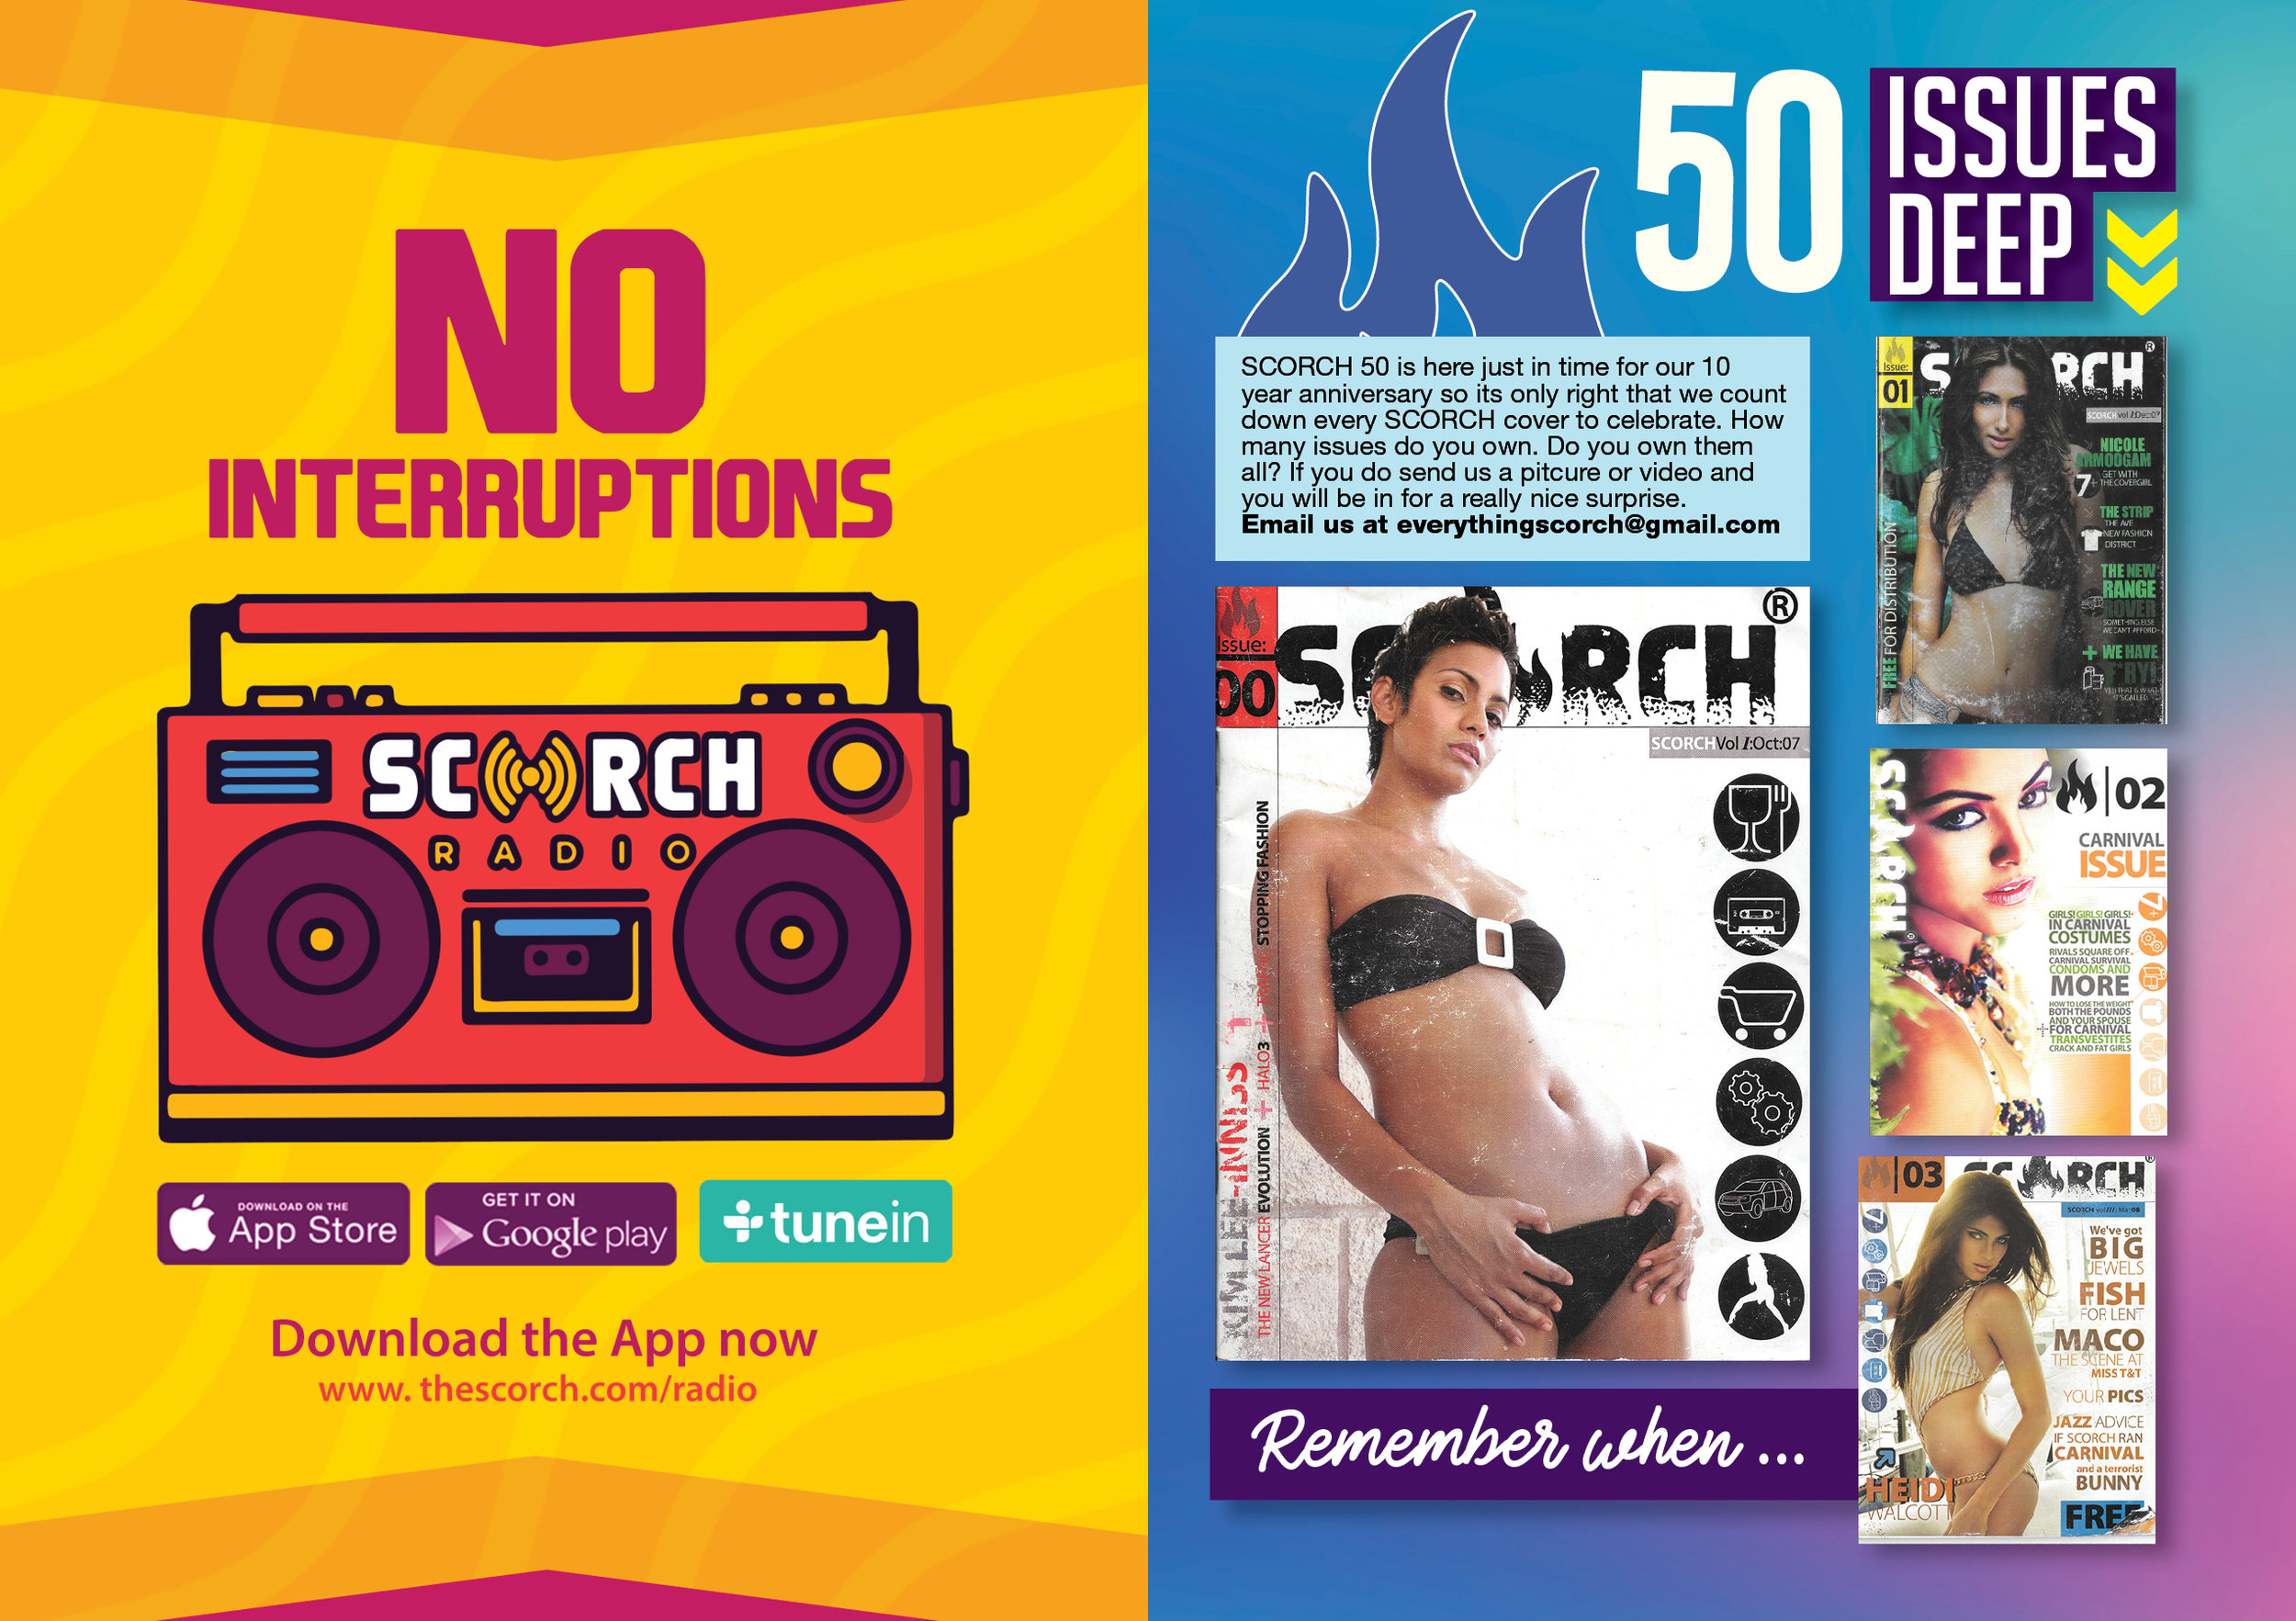 FAW SCORCH ISSUE 50-1_ONLINE16.jpg